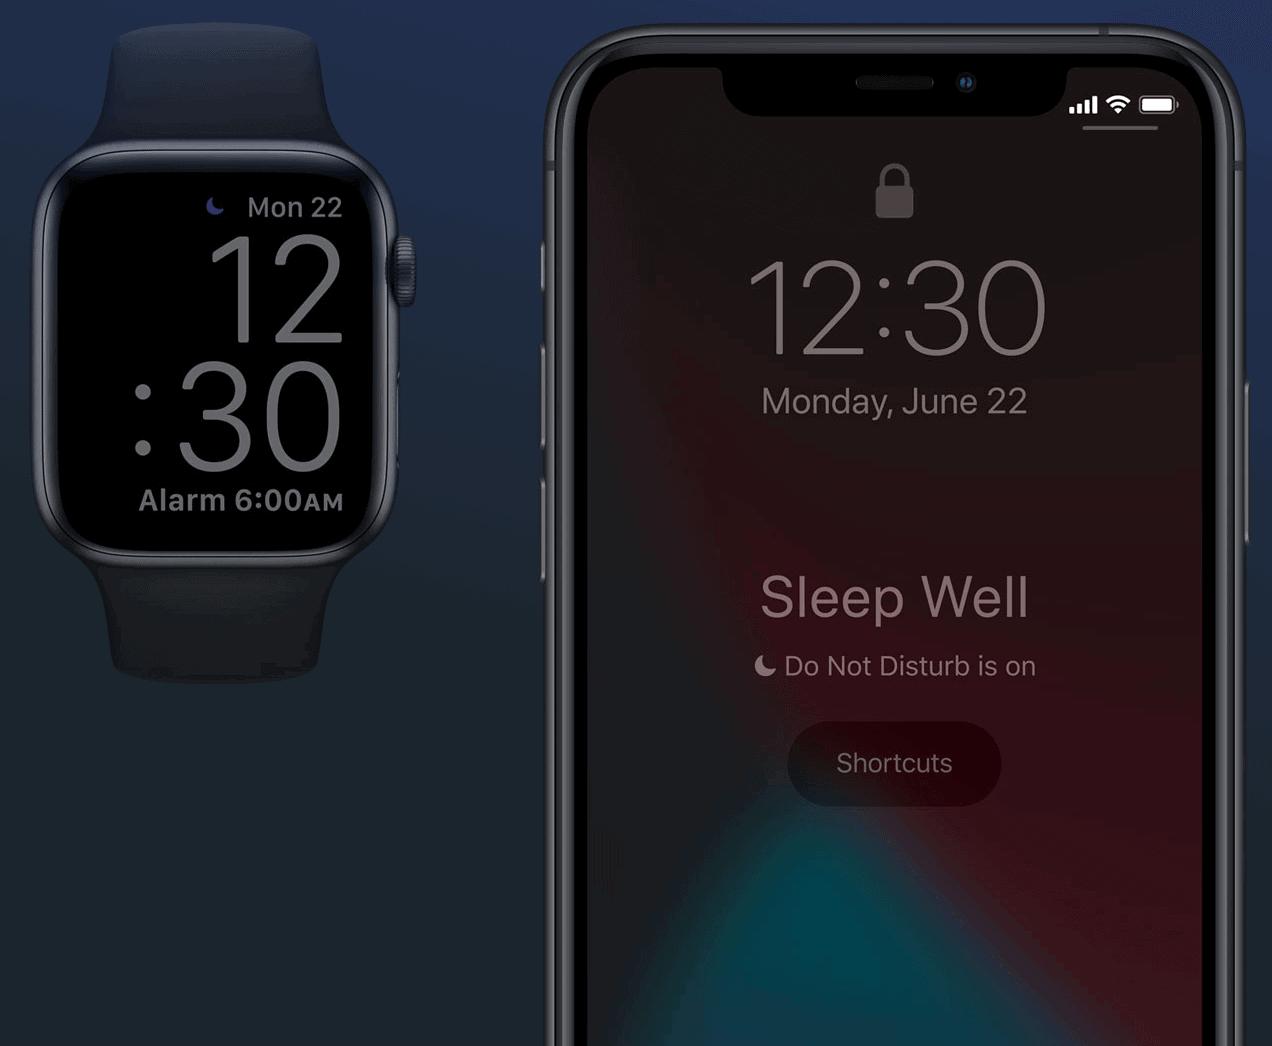 Apple Watch Sleep